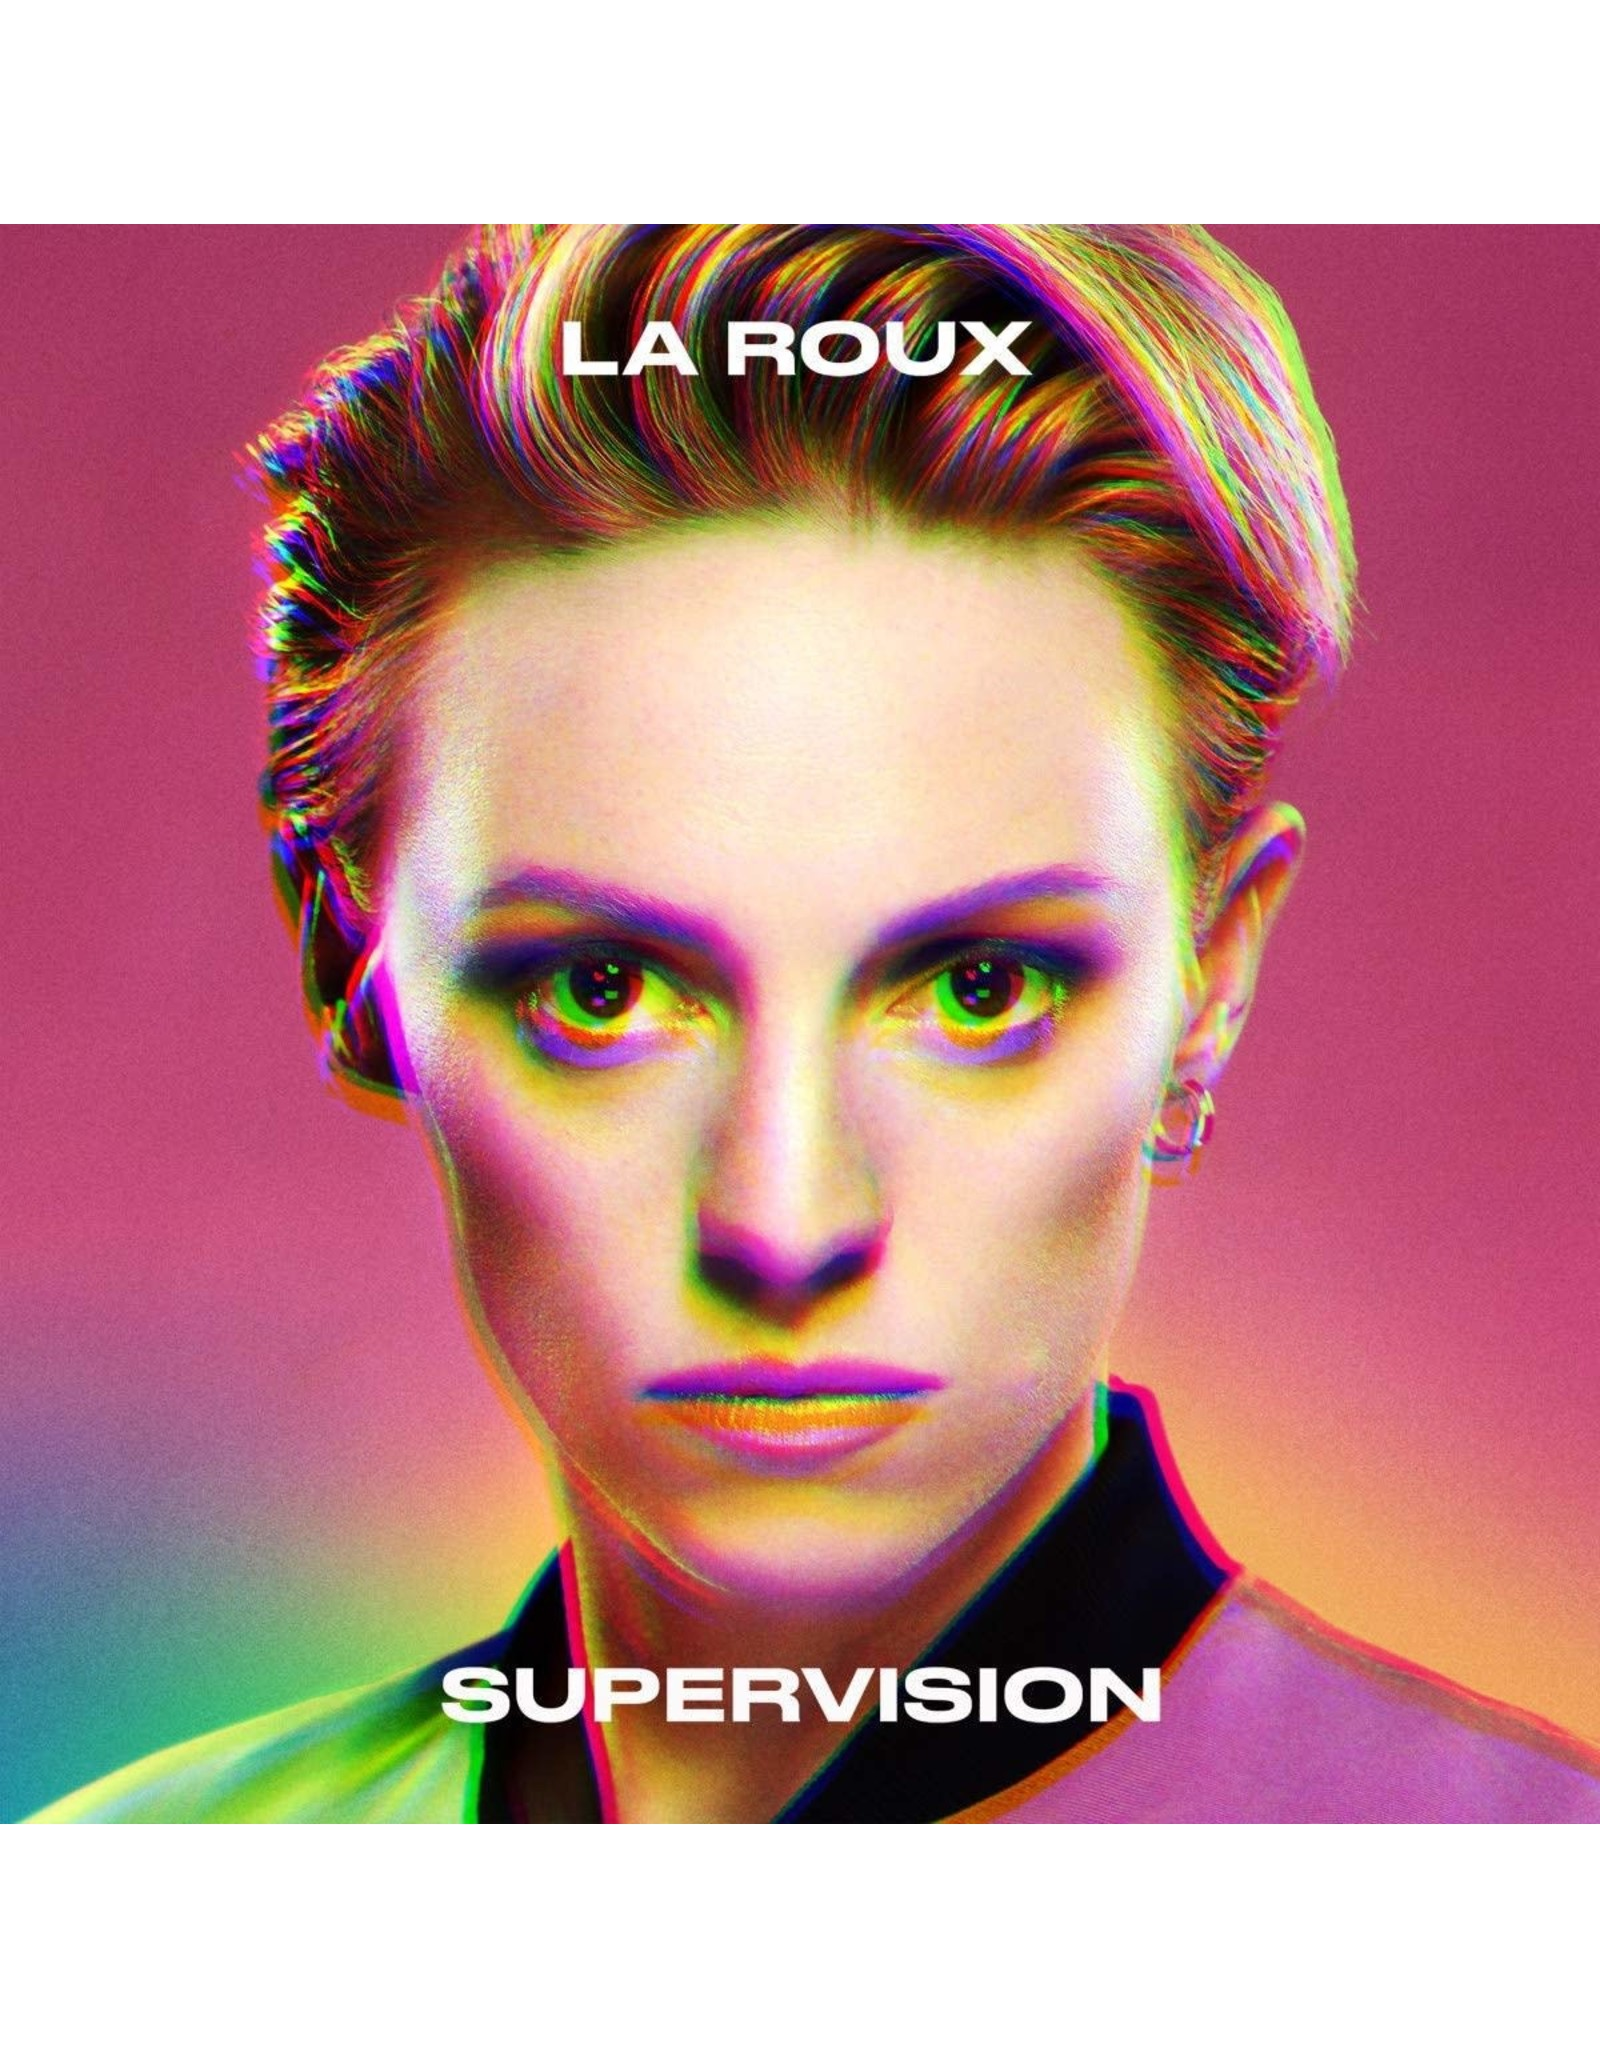 La Roux - Supervision (White Vinyl)